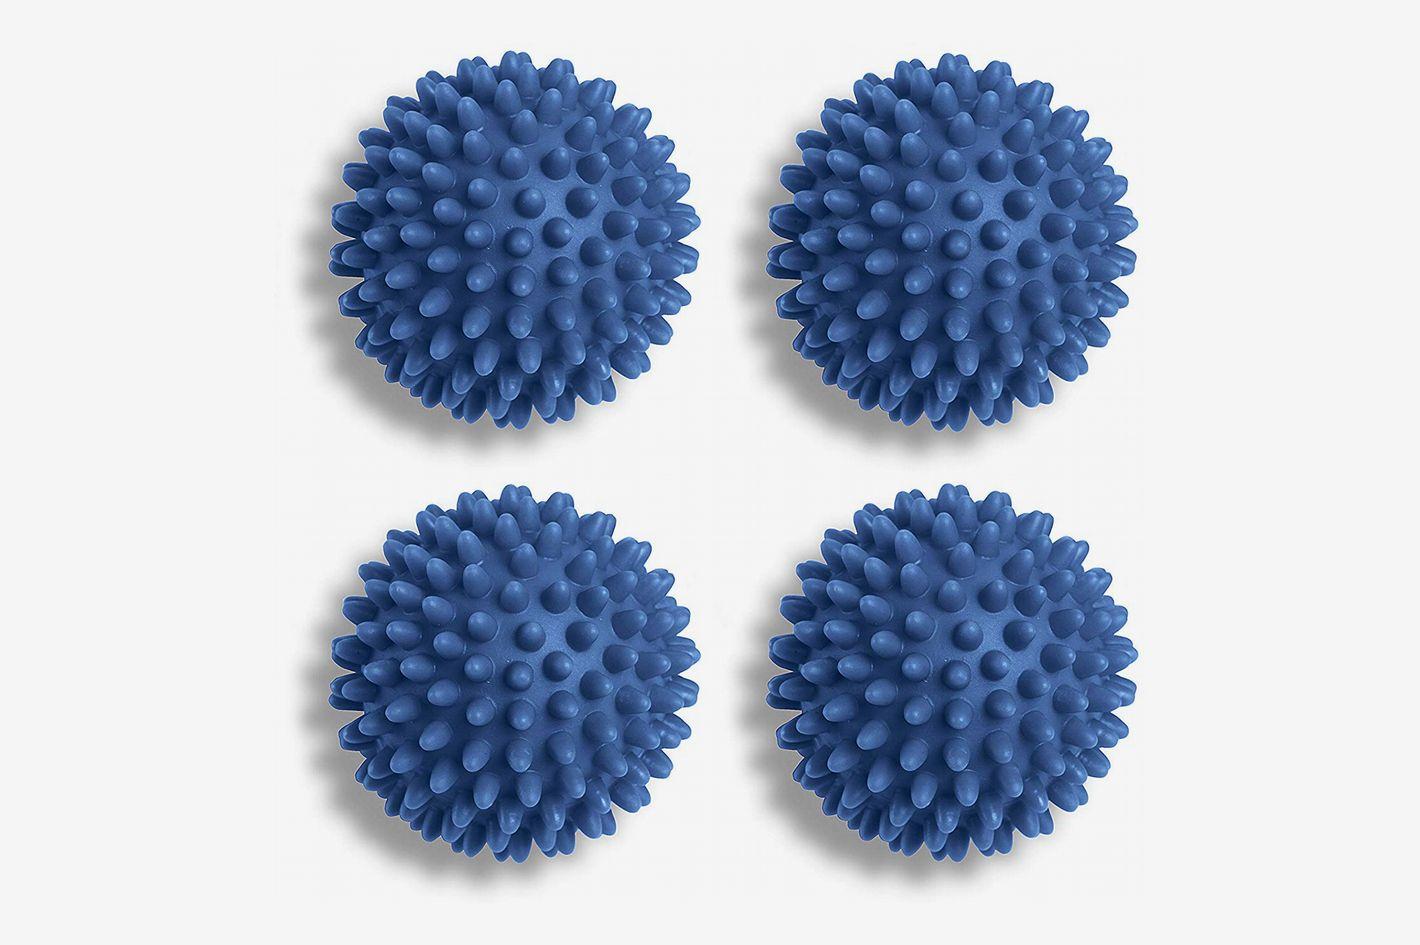 Whitmor Dryer Balls - Eco Friendly Fabric Softener Alternative